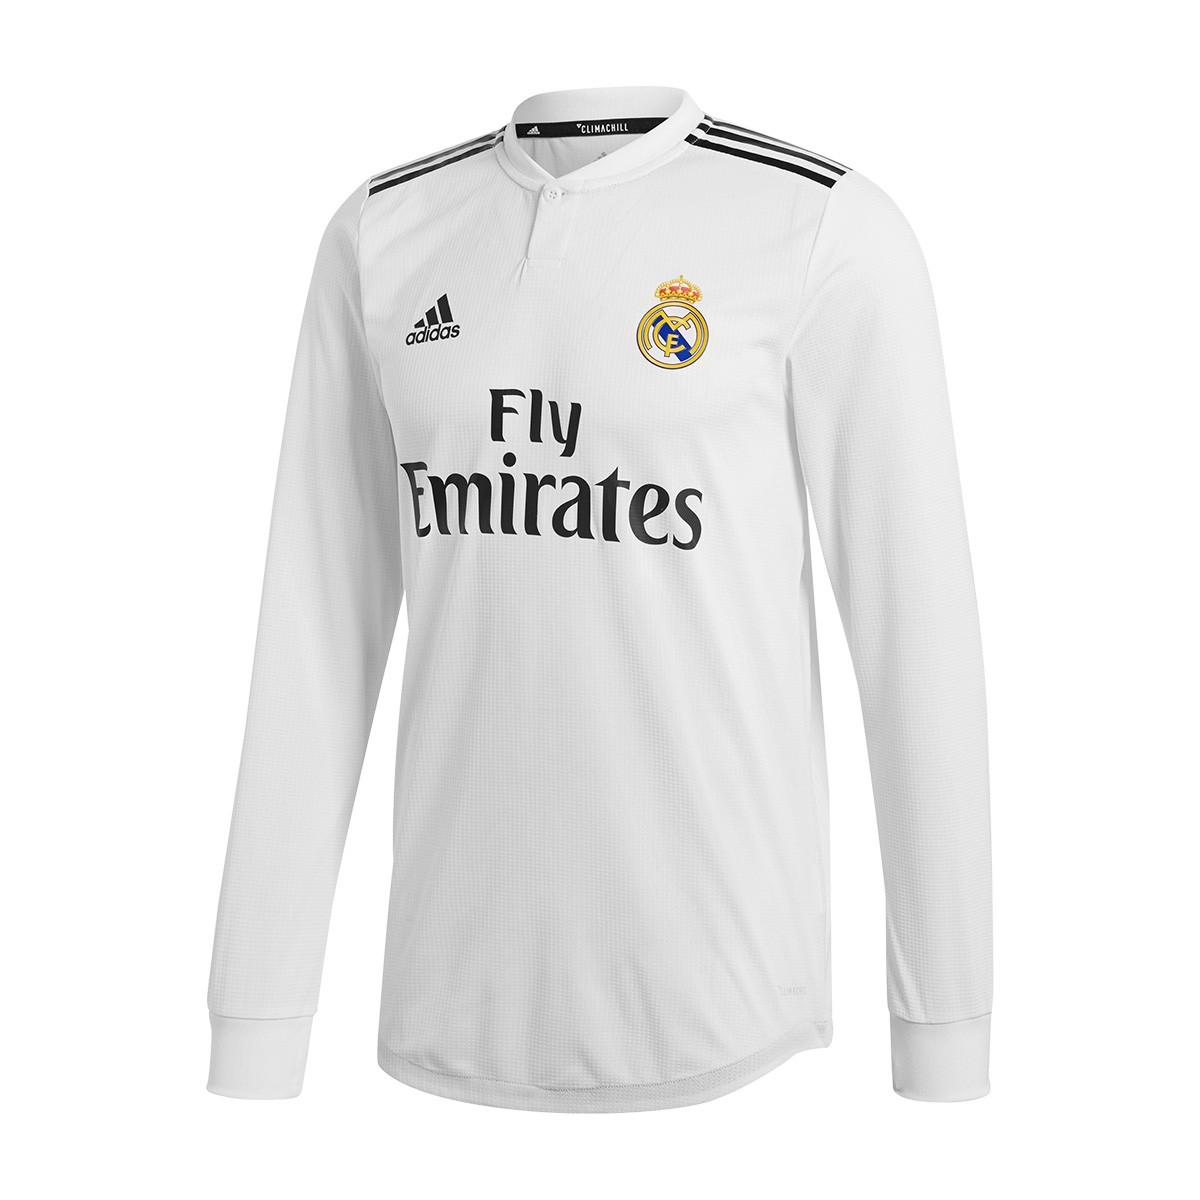 Playera adidas Real Madrid Primera Equipación AU L 2018-2019 White ... e1d21428fe66c